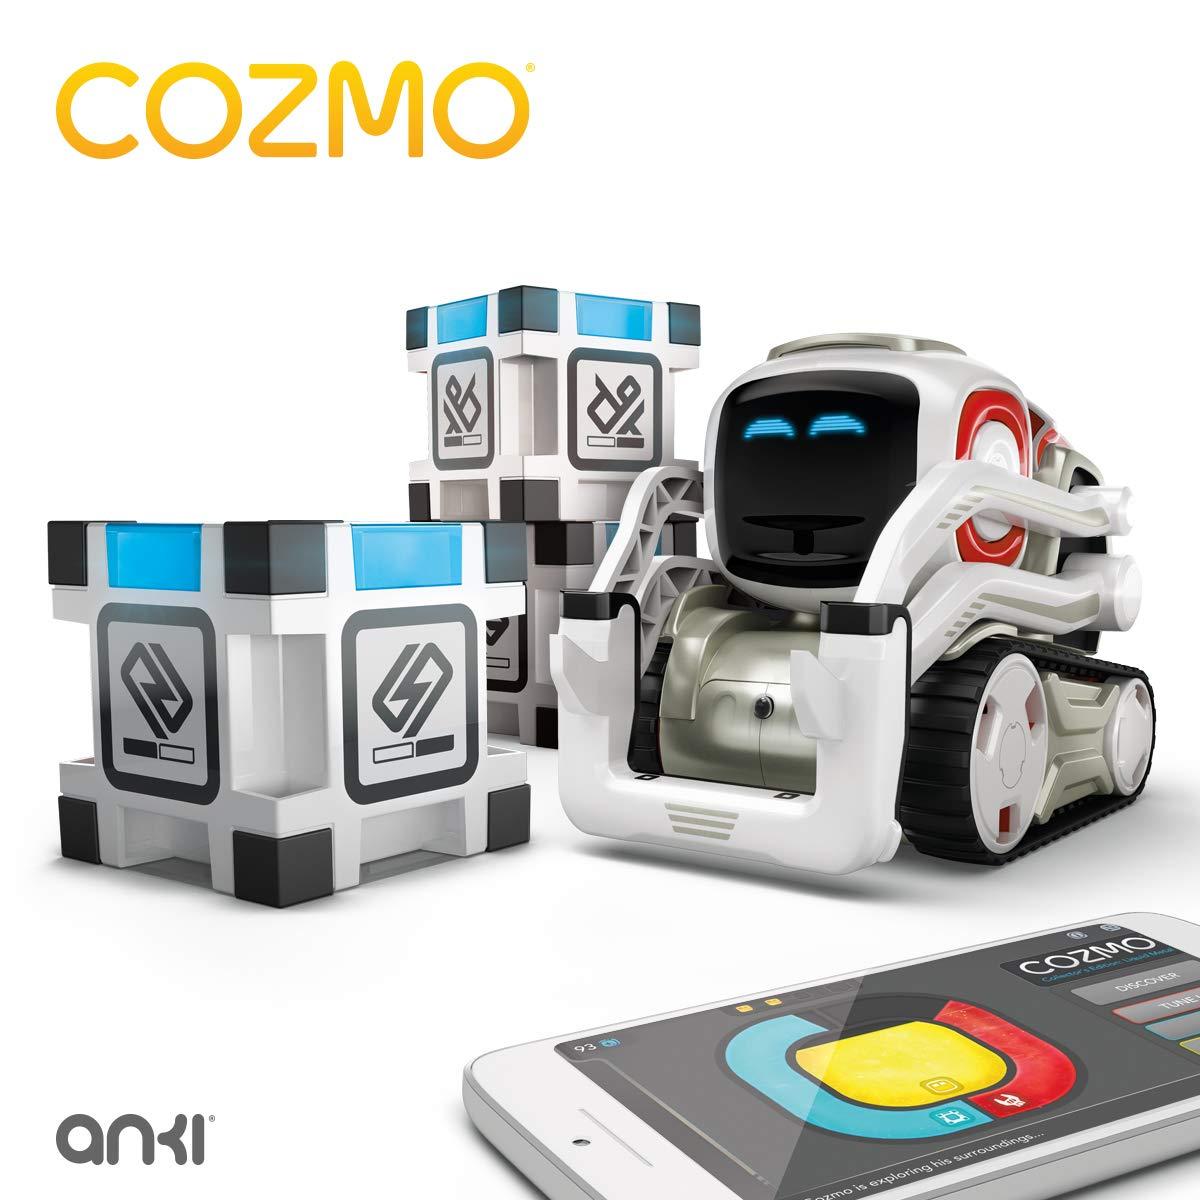 cozmo sdk download